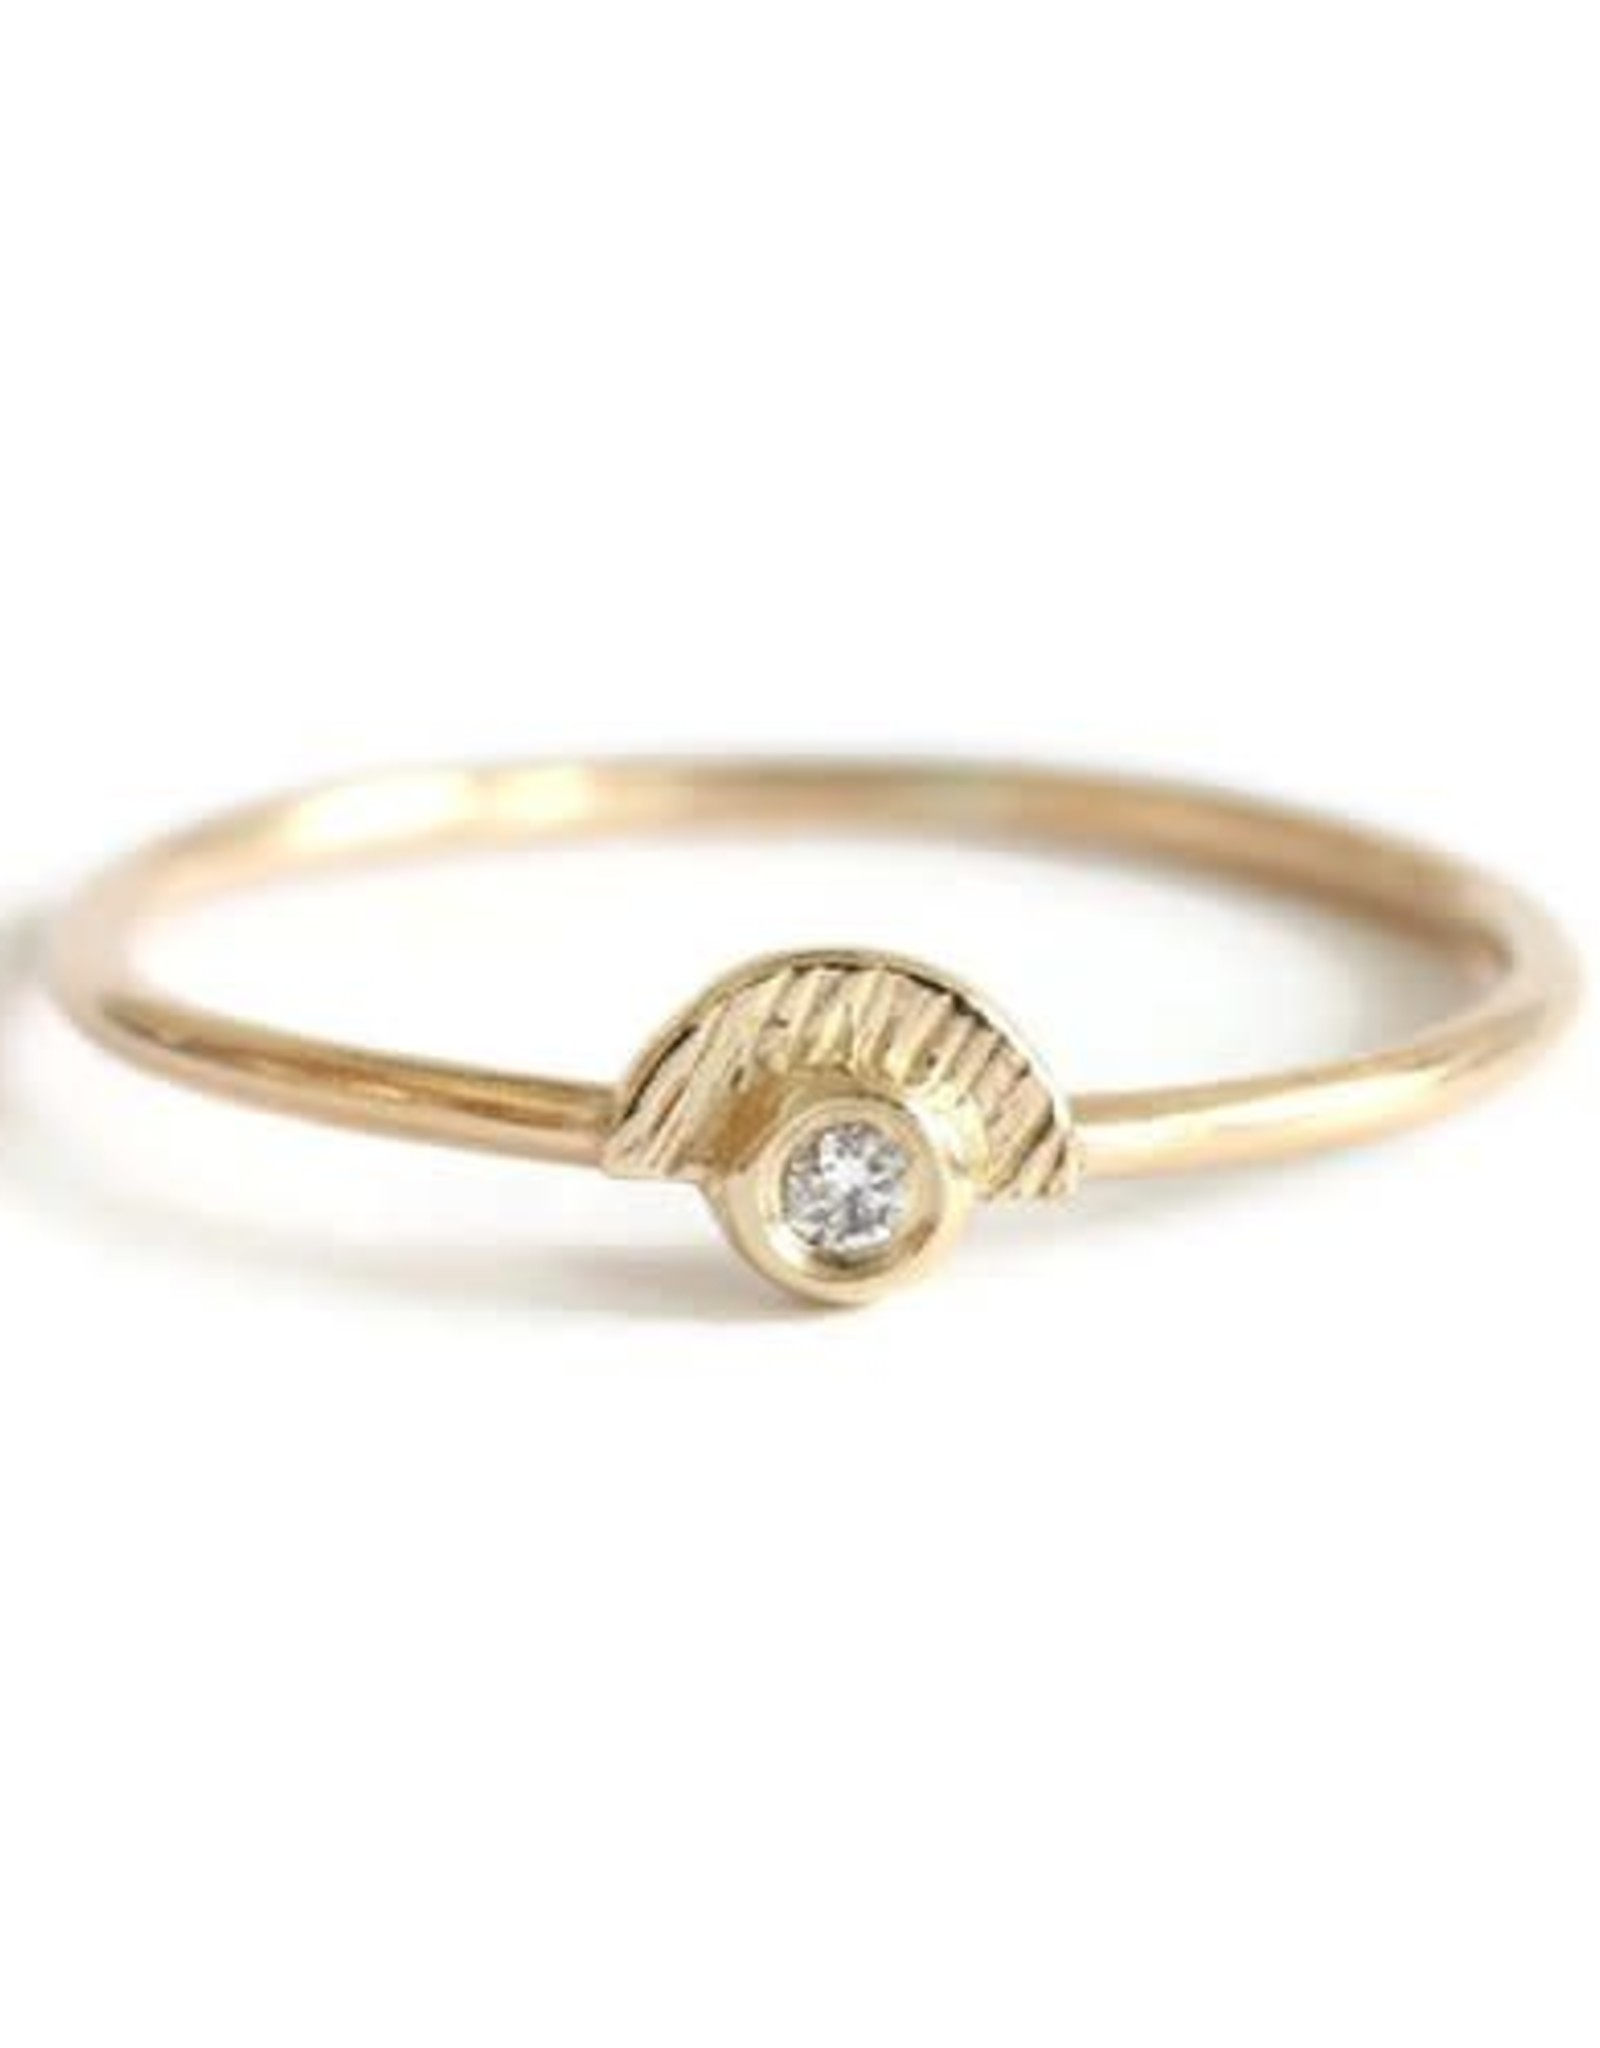 Lio & Linn Sunshine Diamond Ring